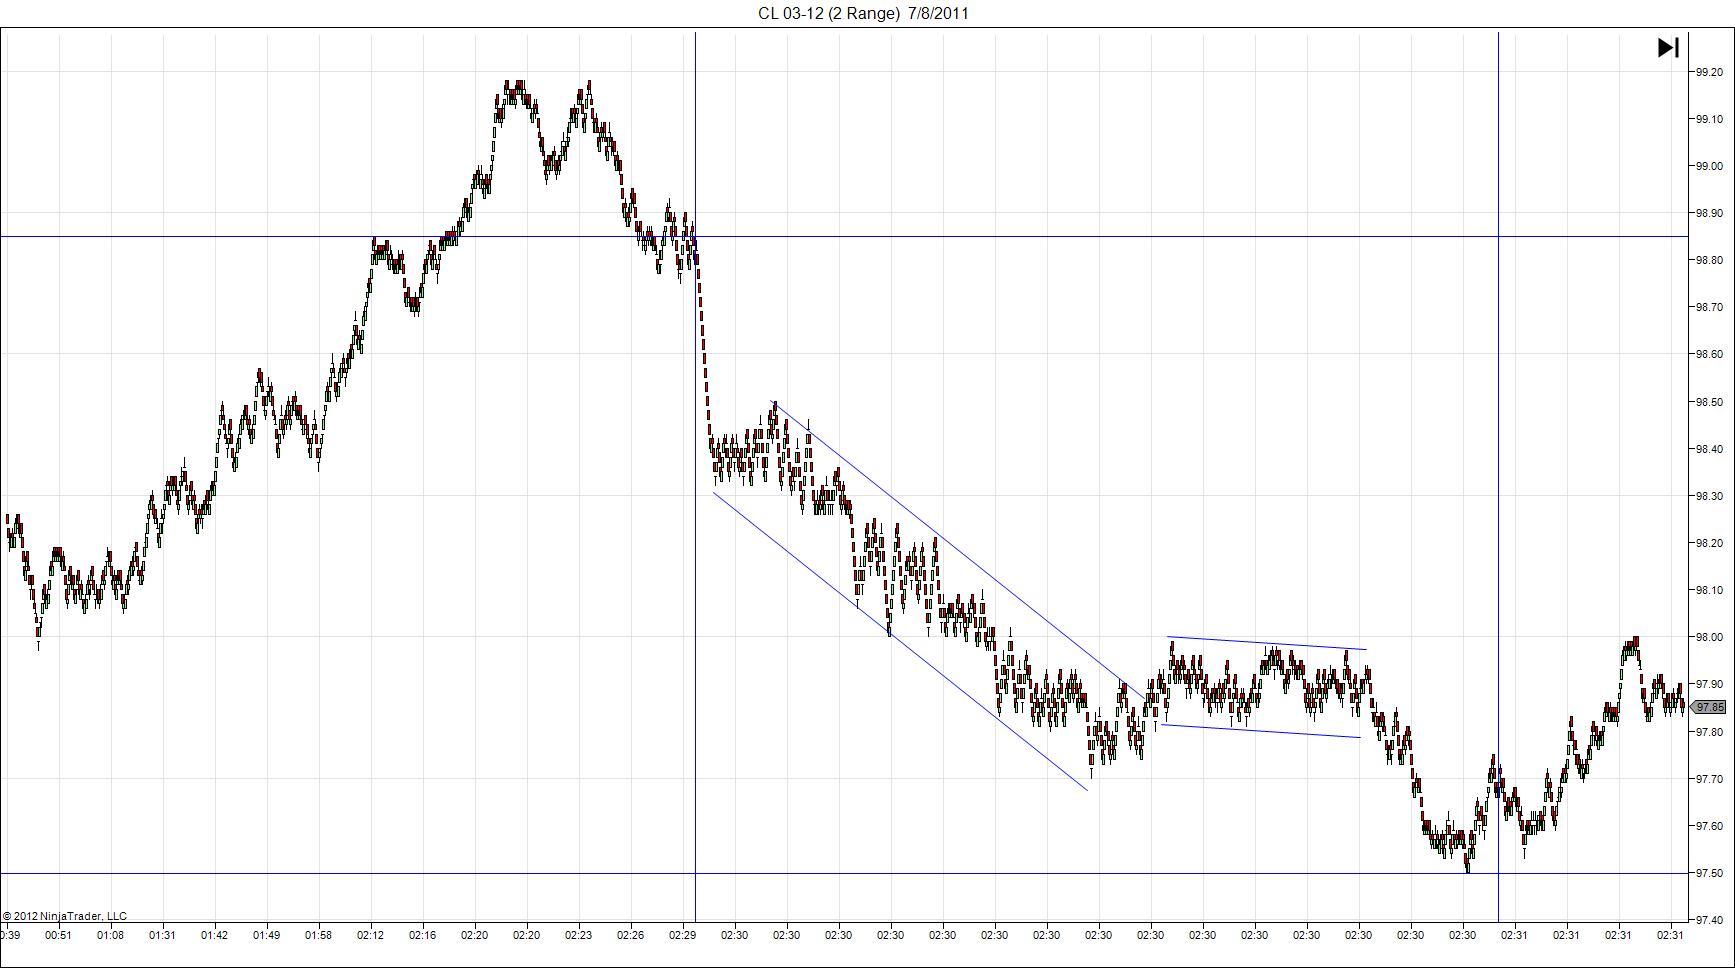 CL 03 12 (2 Range) 07.08.11